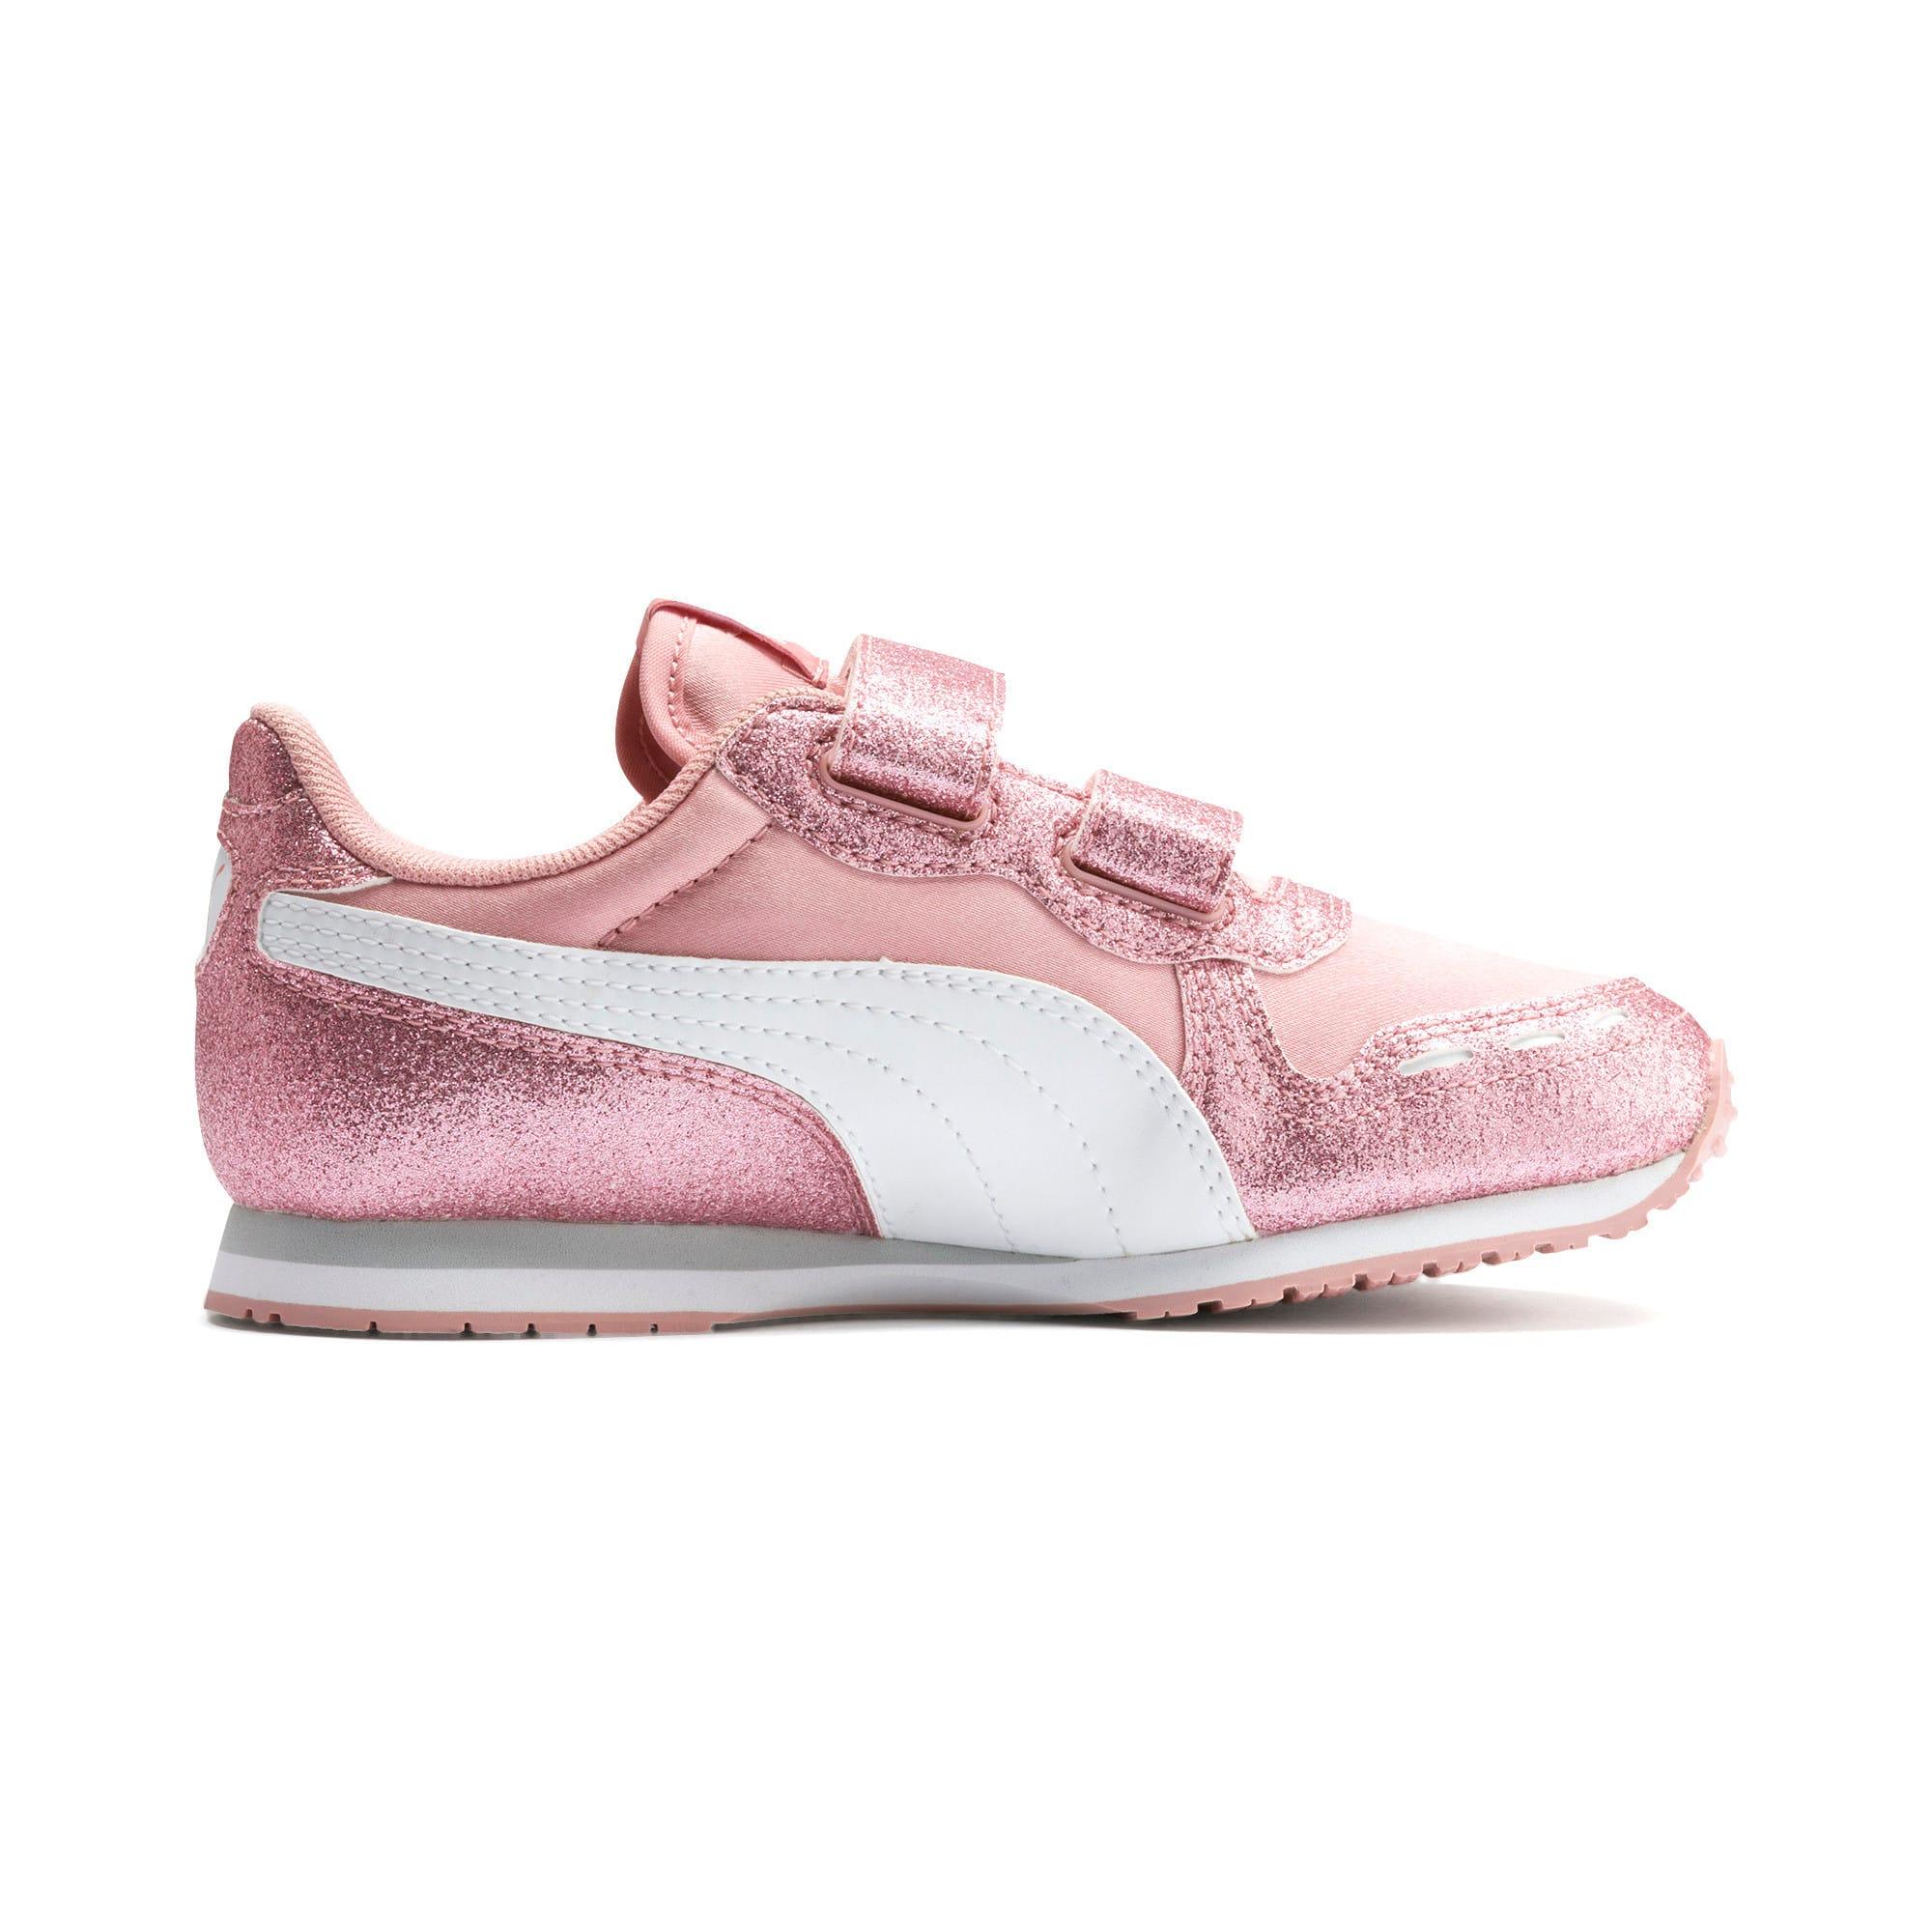 Thumbnail 5 of Cabana Racer Glitz AC Shoes PS, Bridal Rose-Puma White, medium